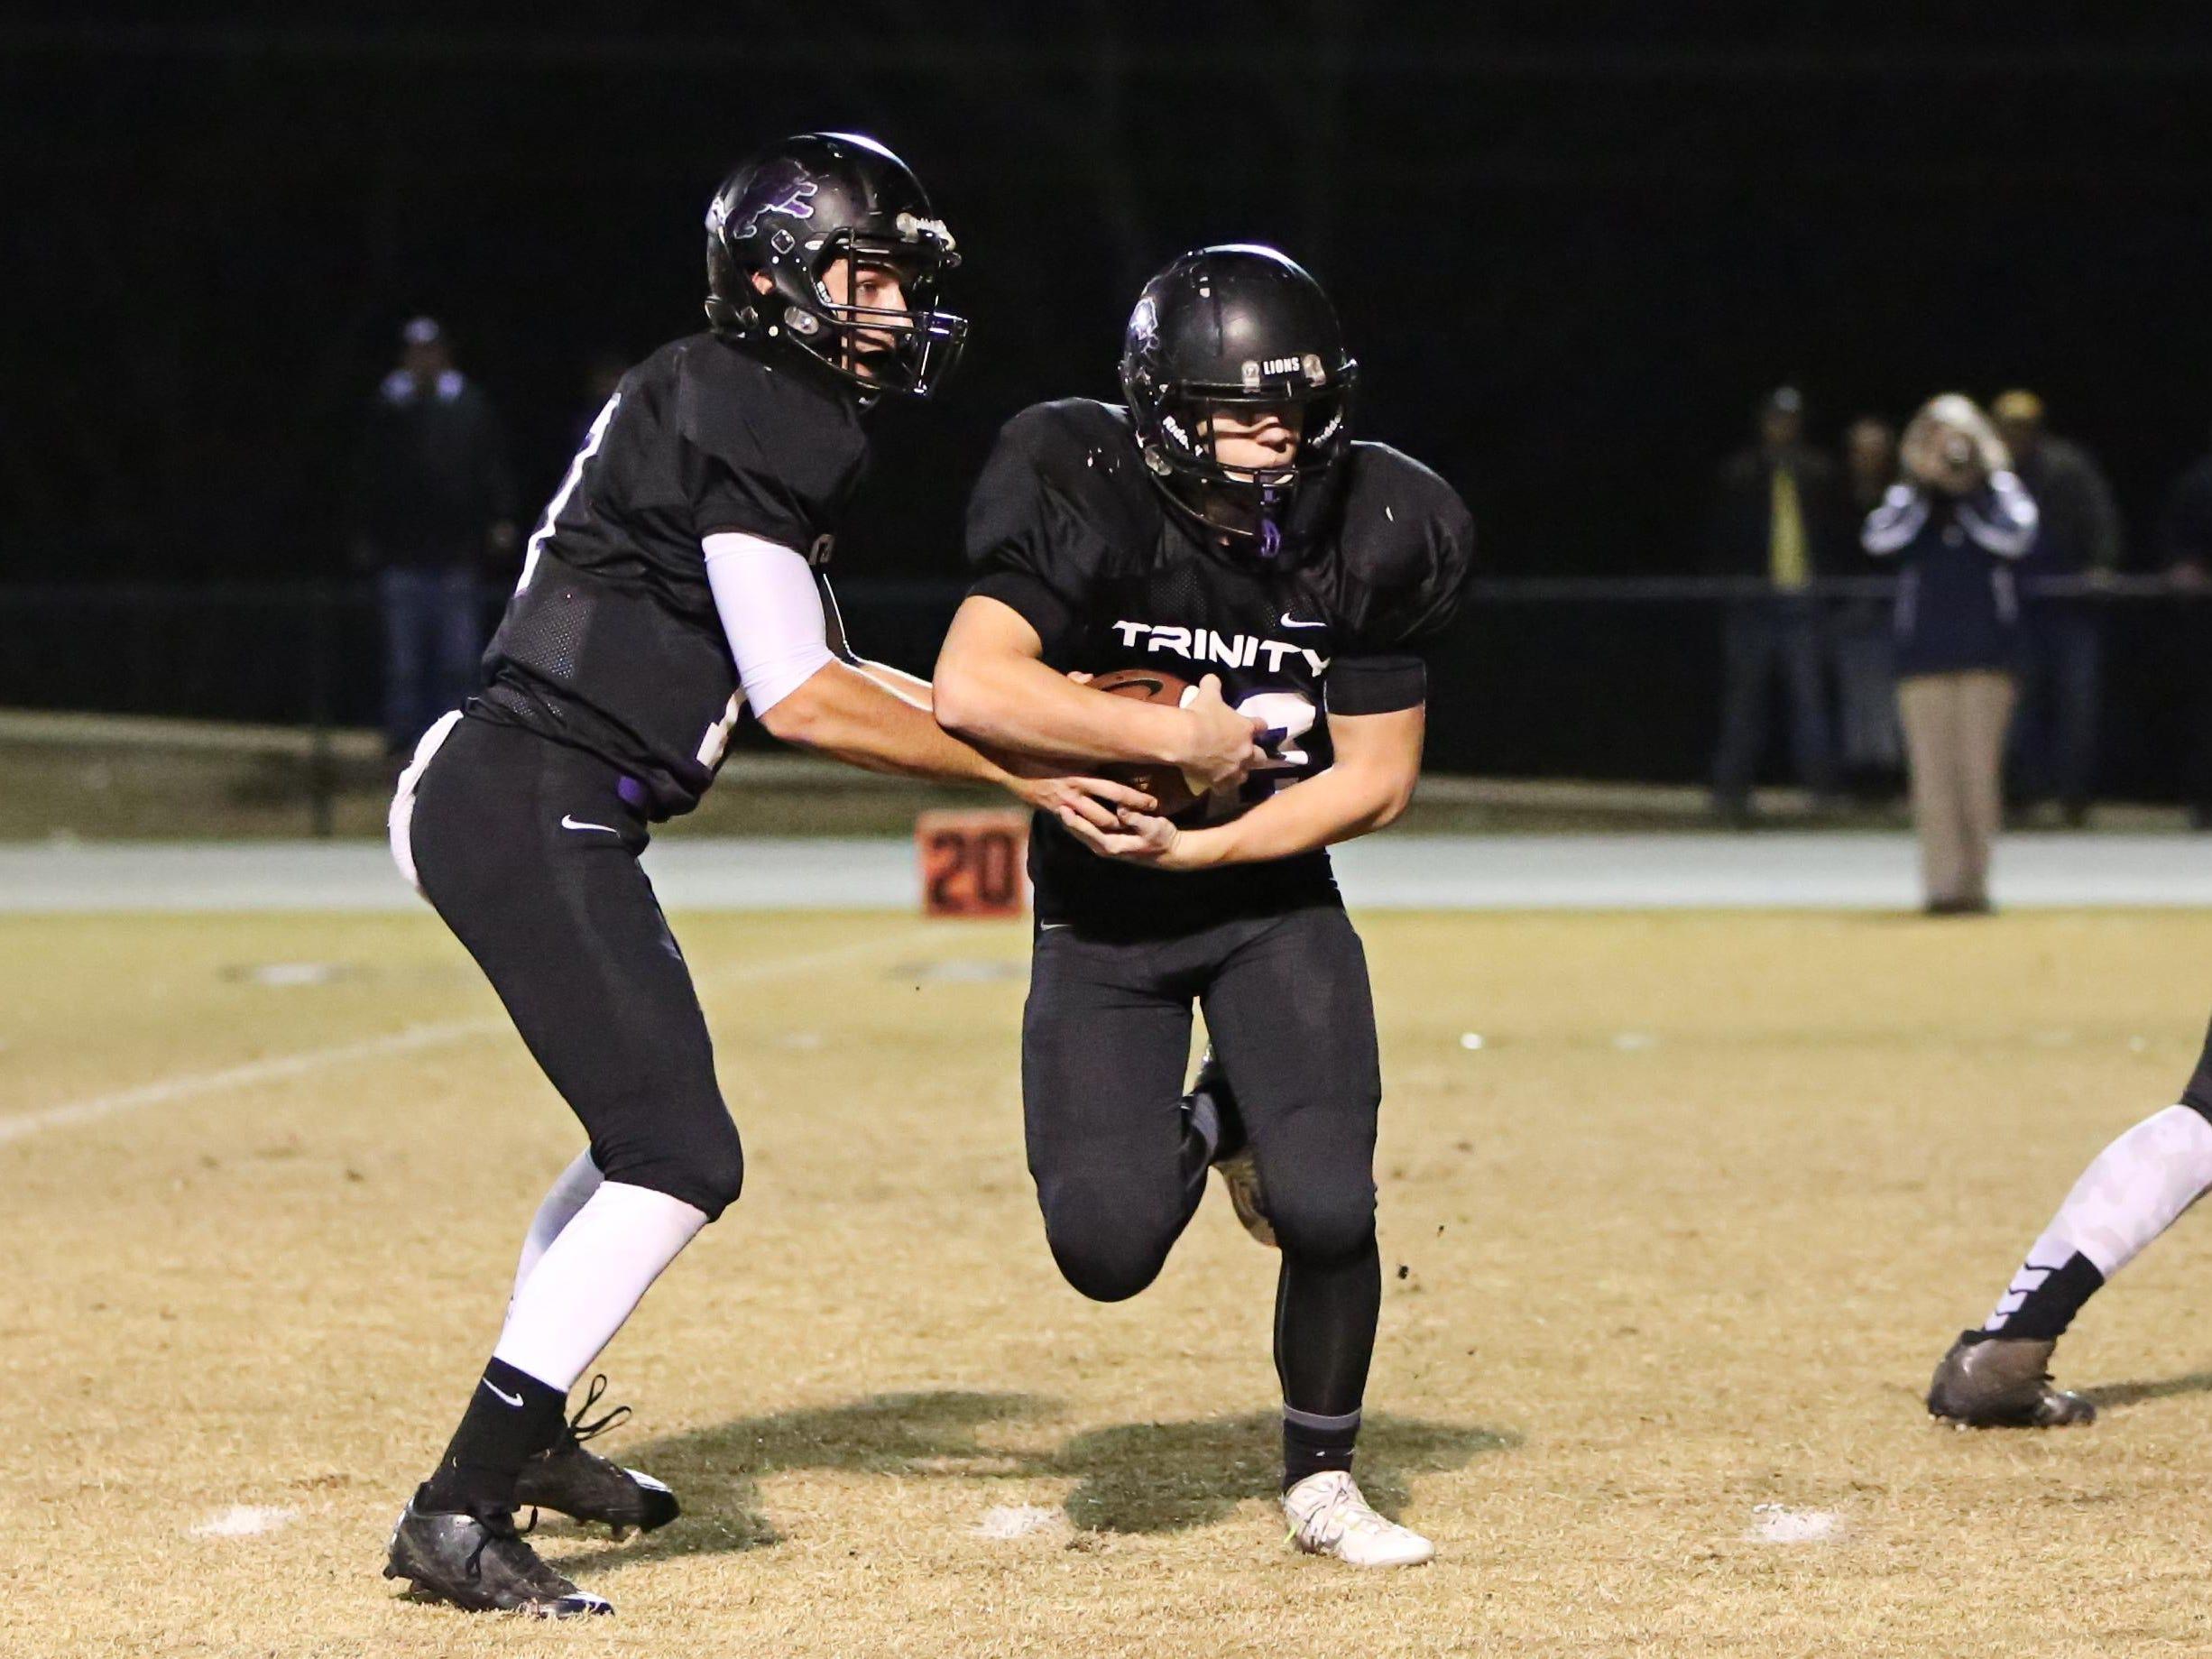 Trinity quarterback Tristan Bonstetter fakes the handoff to Greyson Long in Friday's Class 2A semifinal game vs. Trezevant.